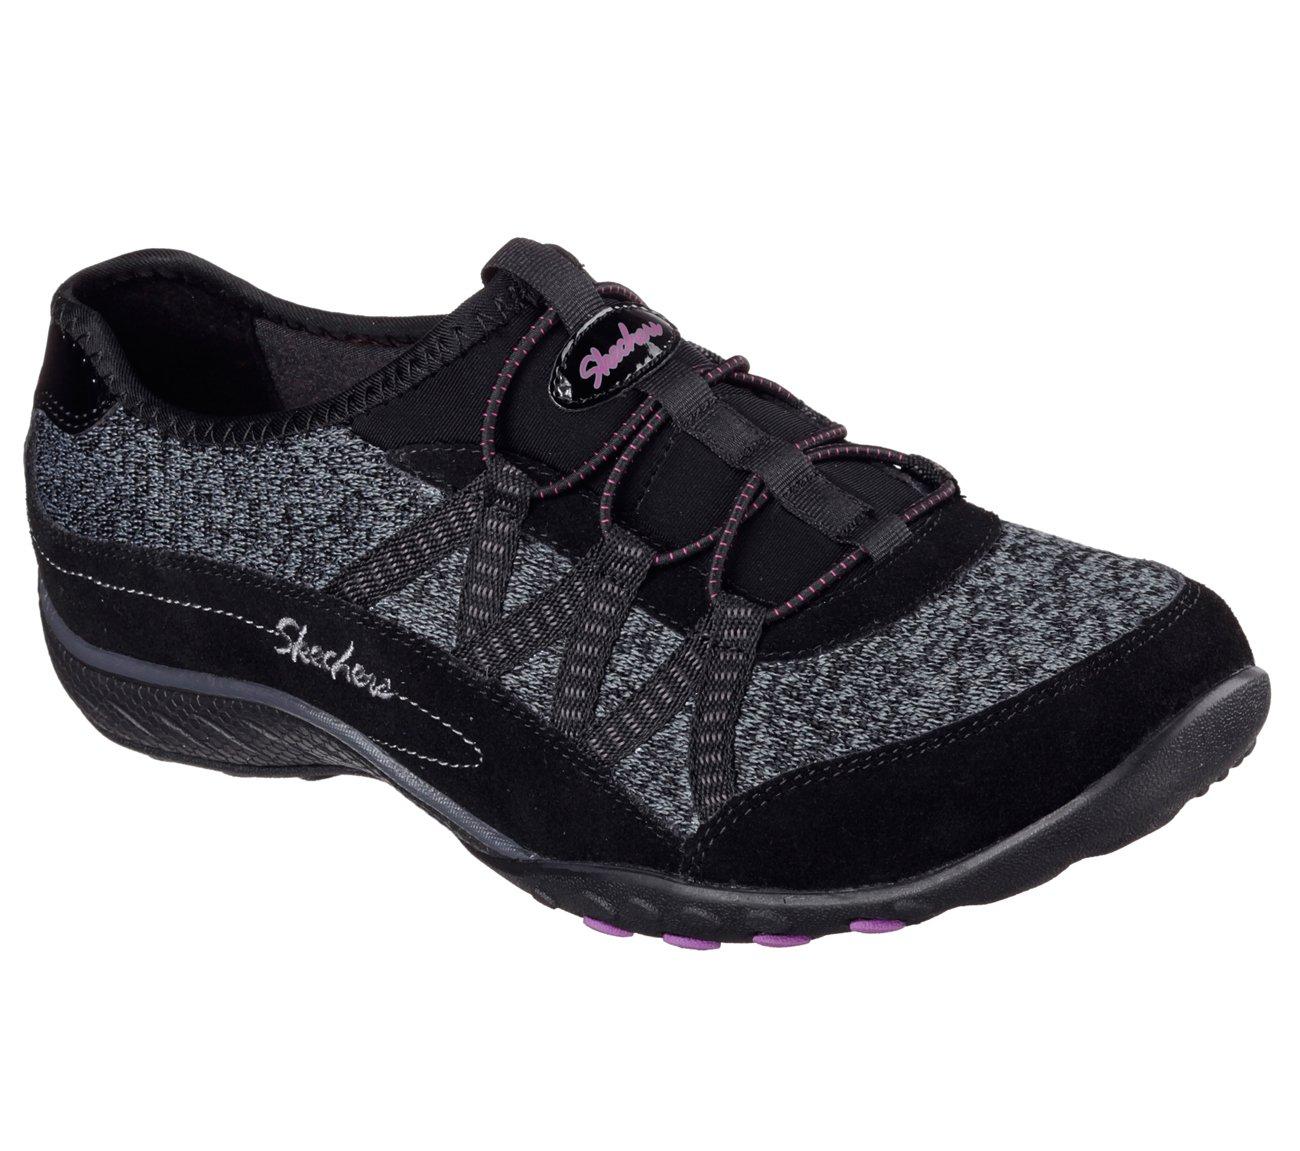 Skechers Relaxed Fit Breathe Easy Road Tripper Womens Slip On Sneakers Black 9.5